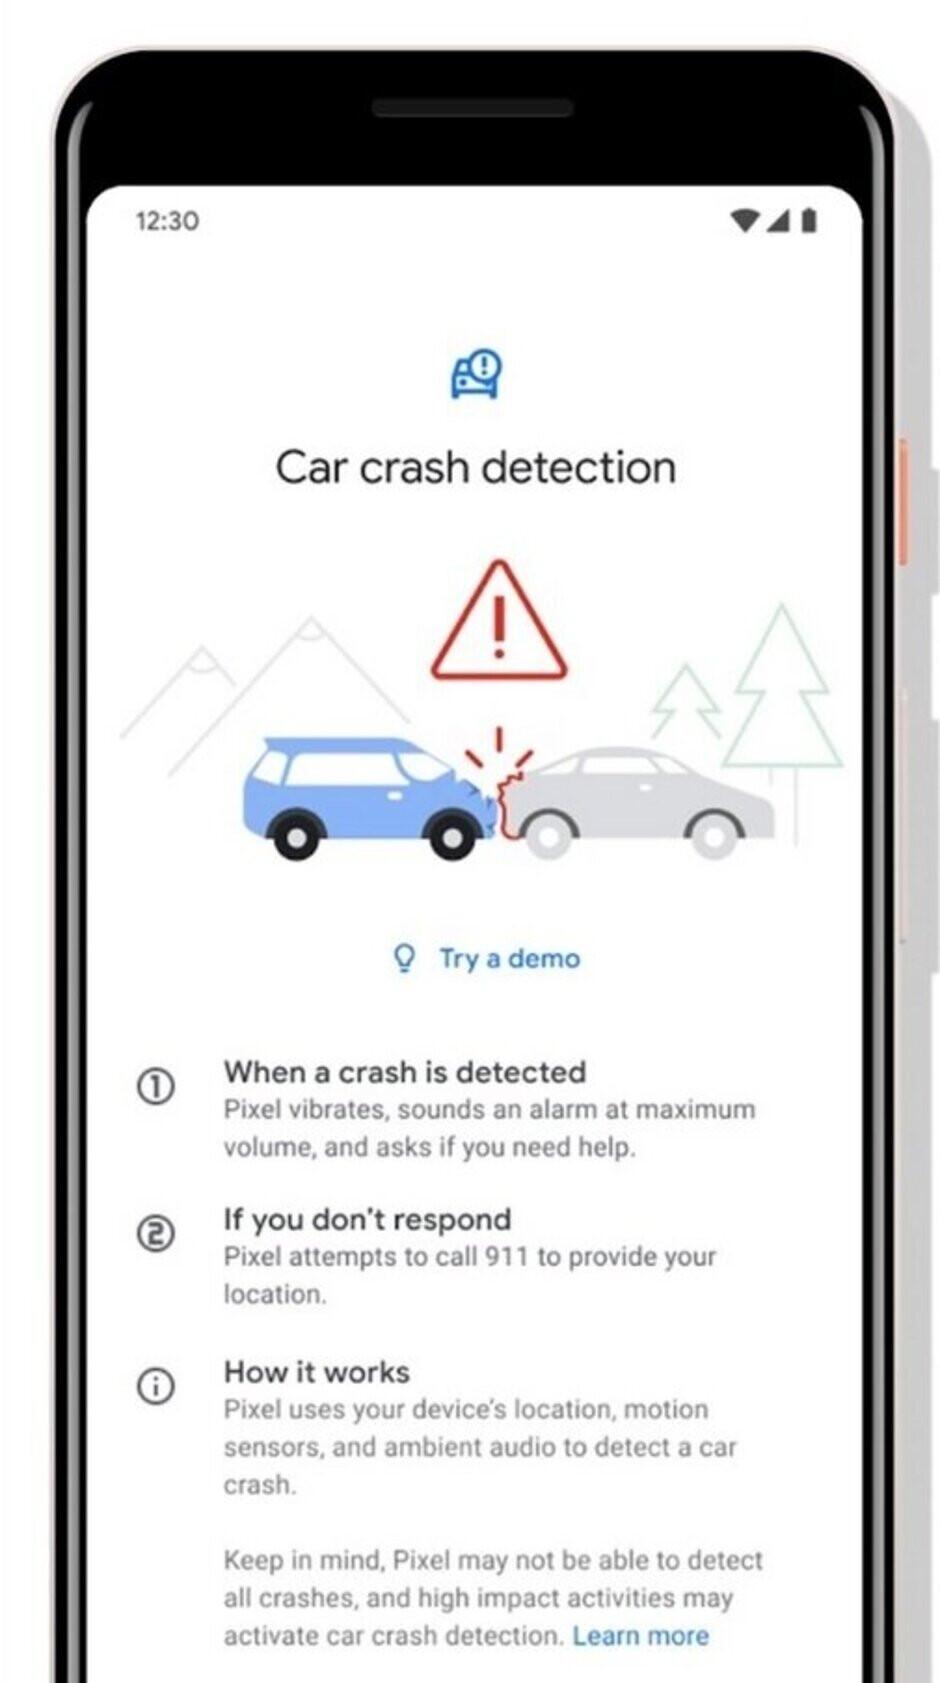 Car crash detection is coming to the Pixels - Google accidentally leaks car crash detection for Pixel handsets